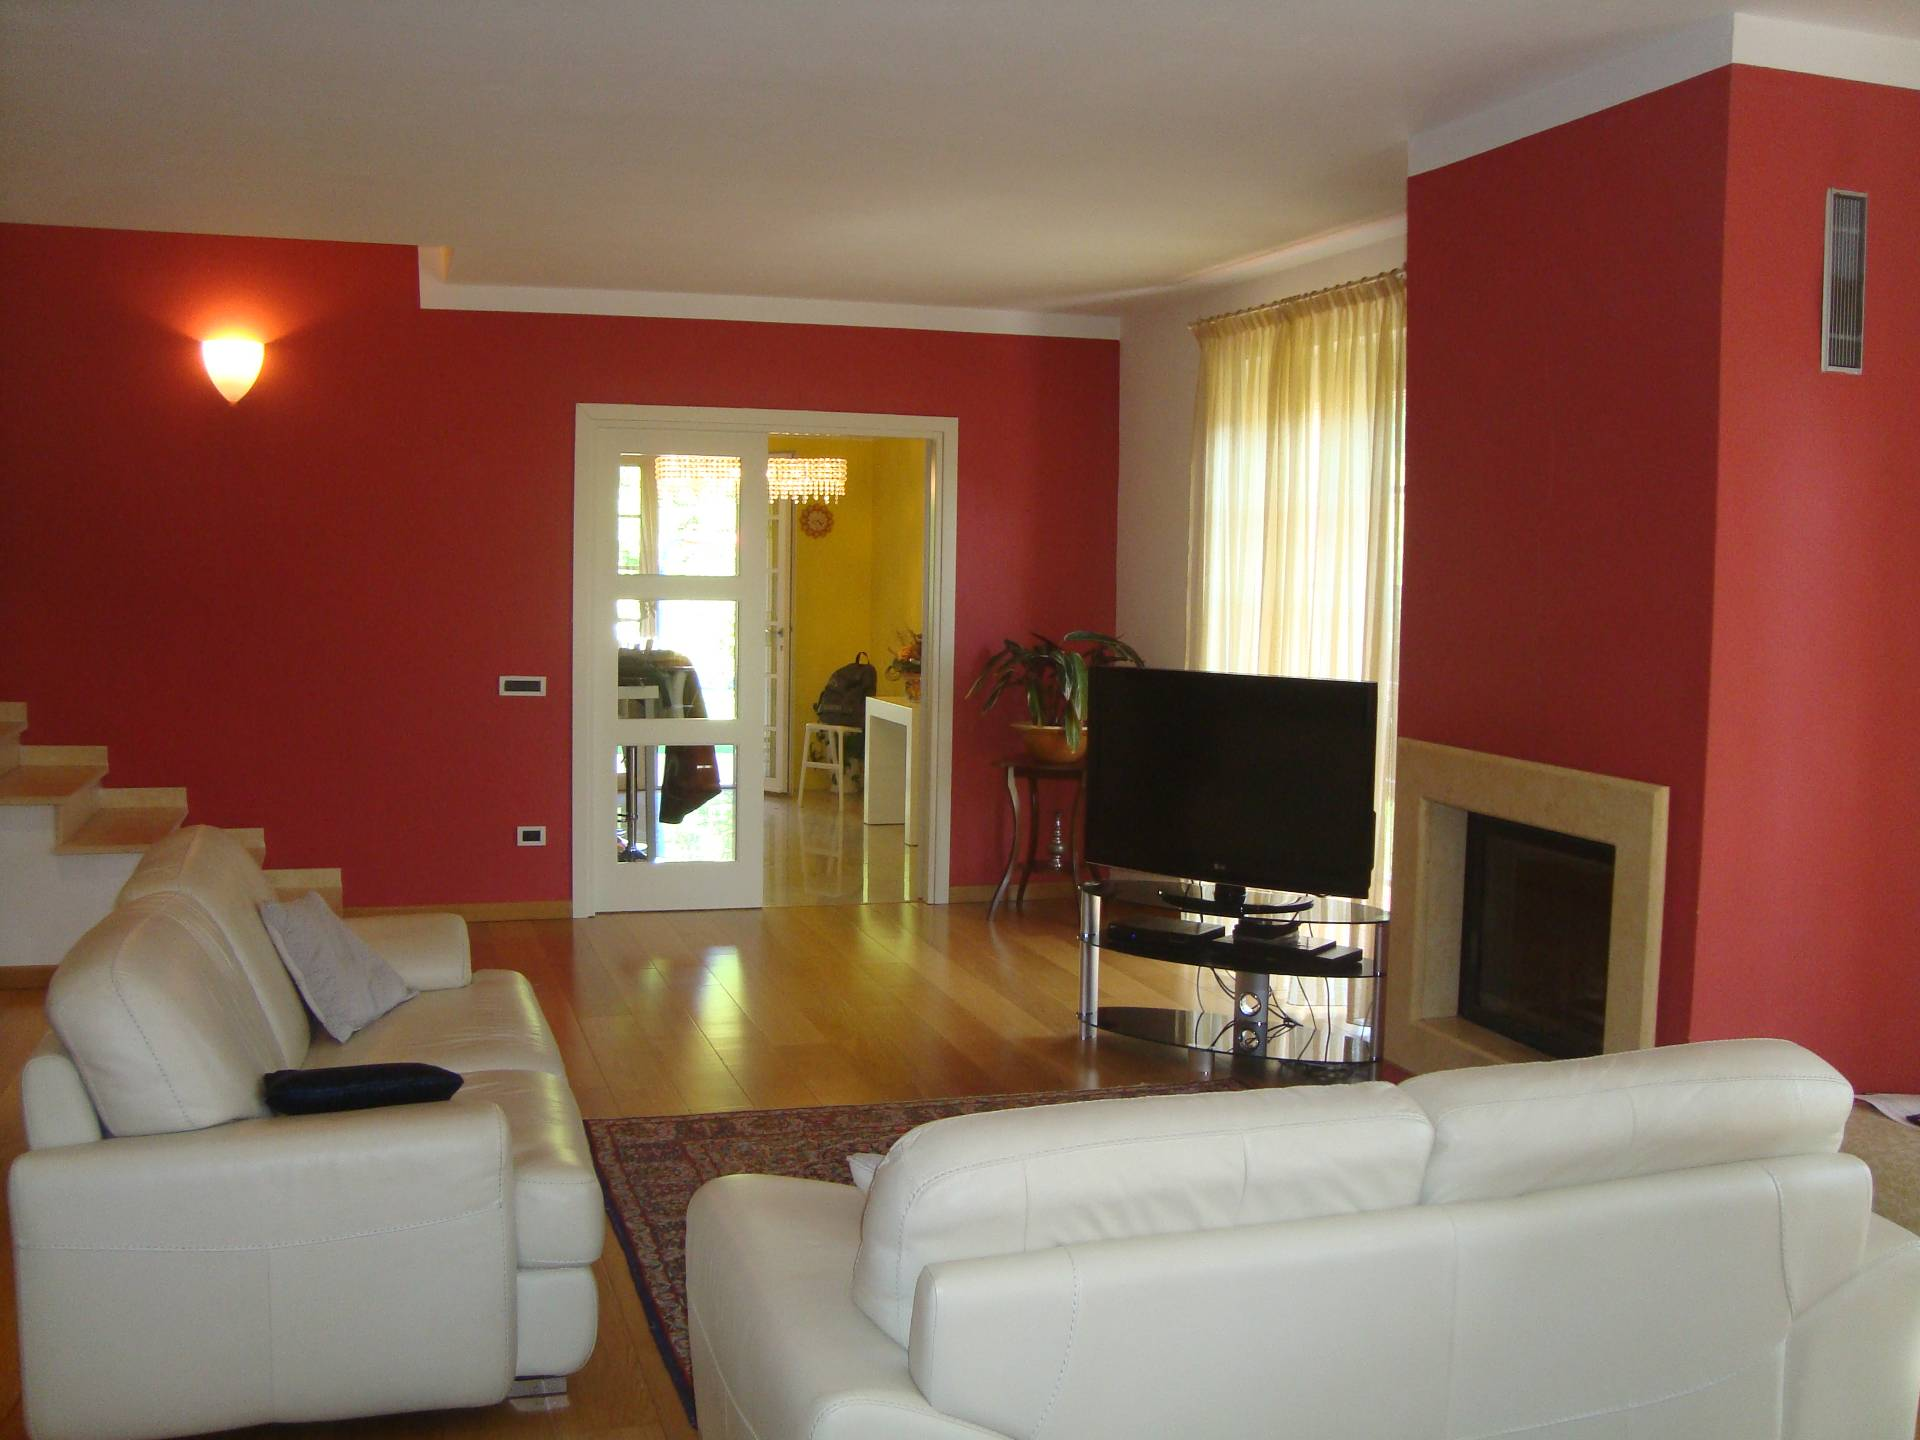 Villa in vendita a Bagni di Lucca, 6 locali, Trattative riservate | CambioCasa.it